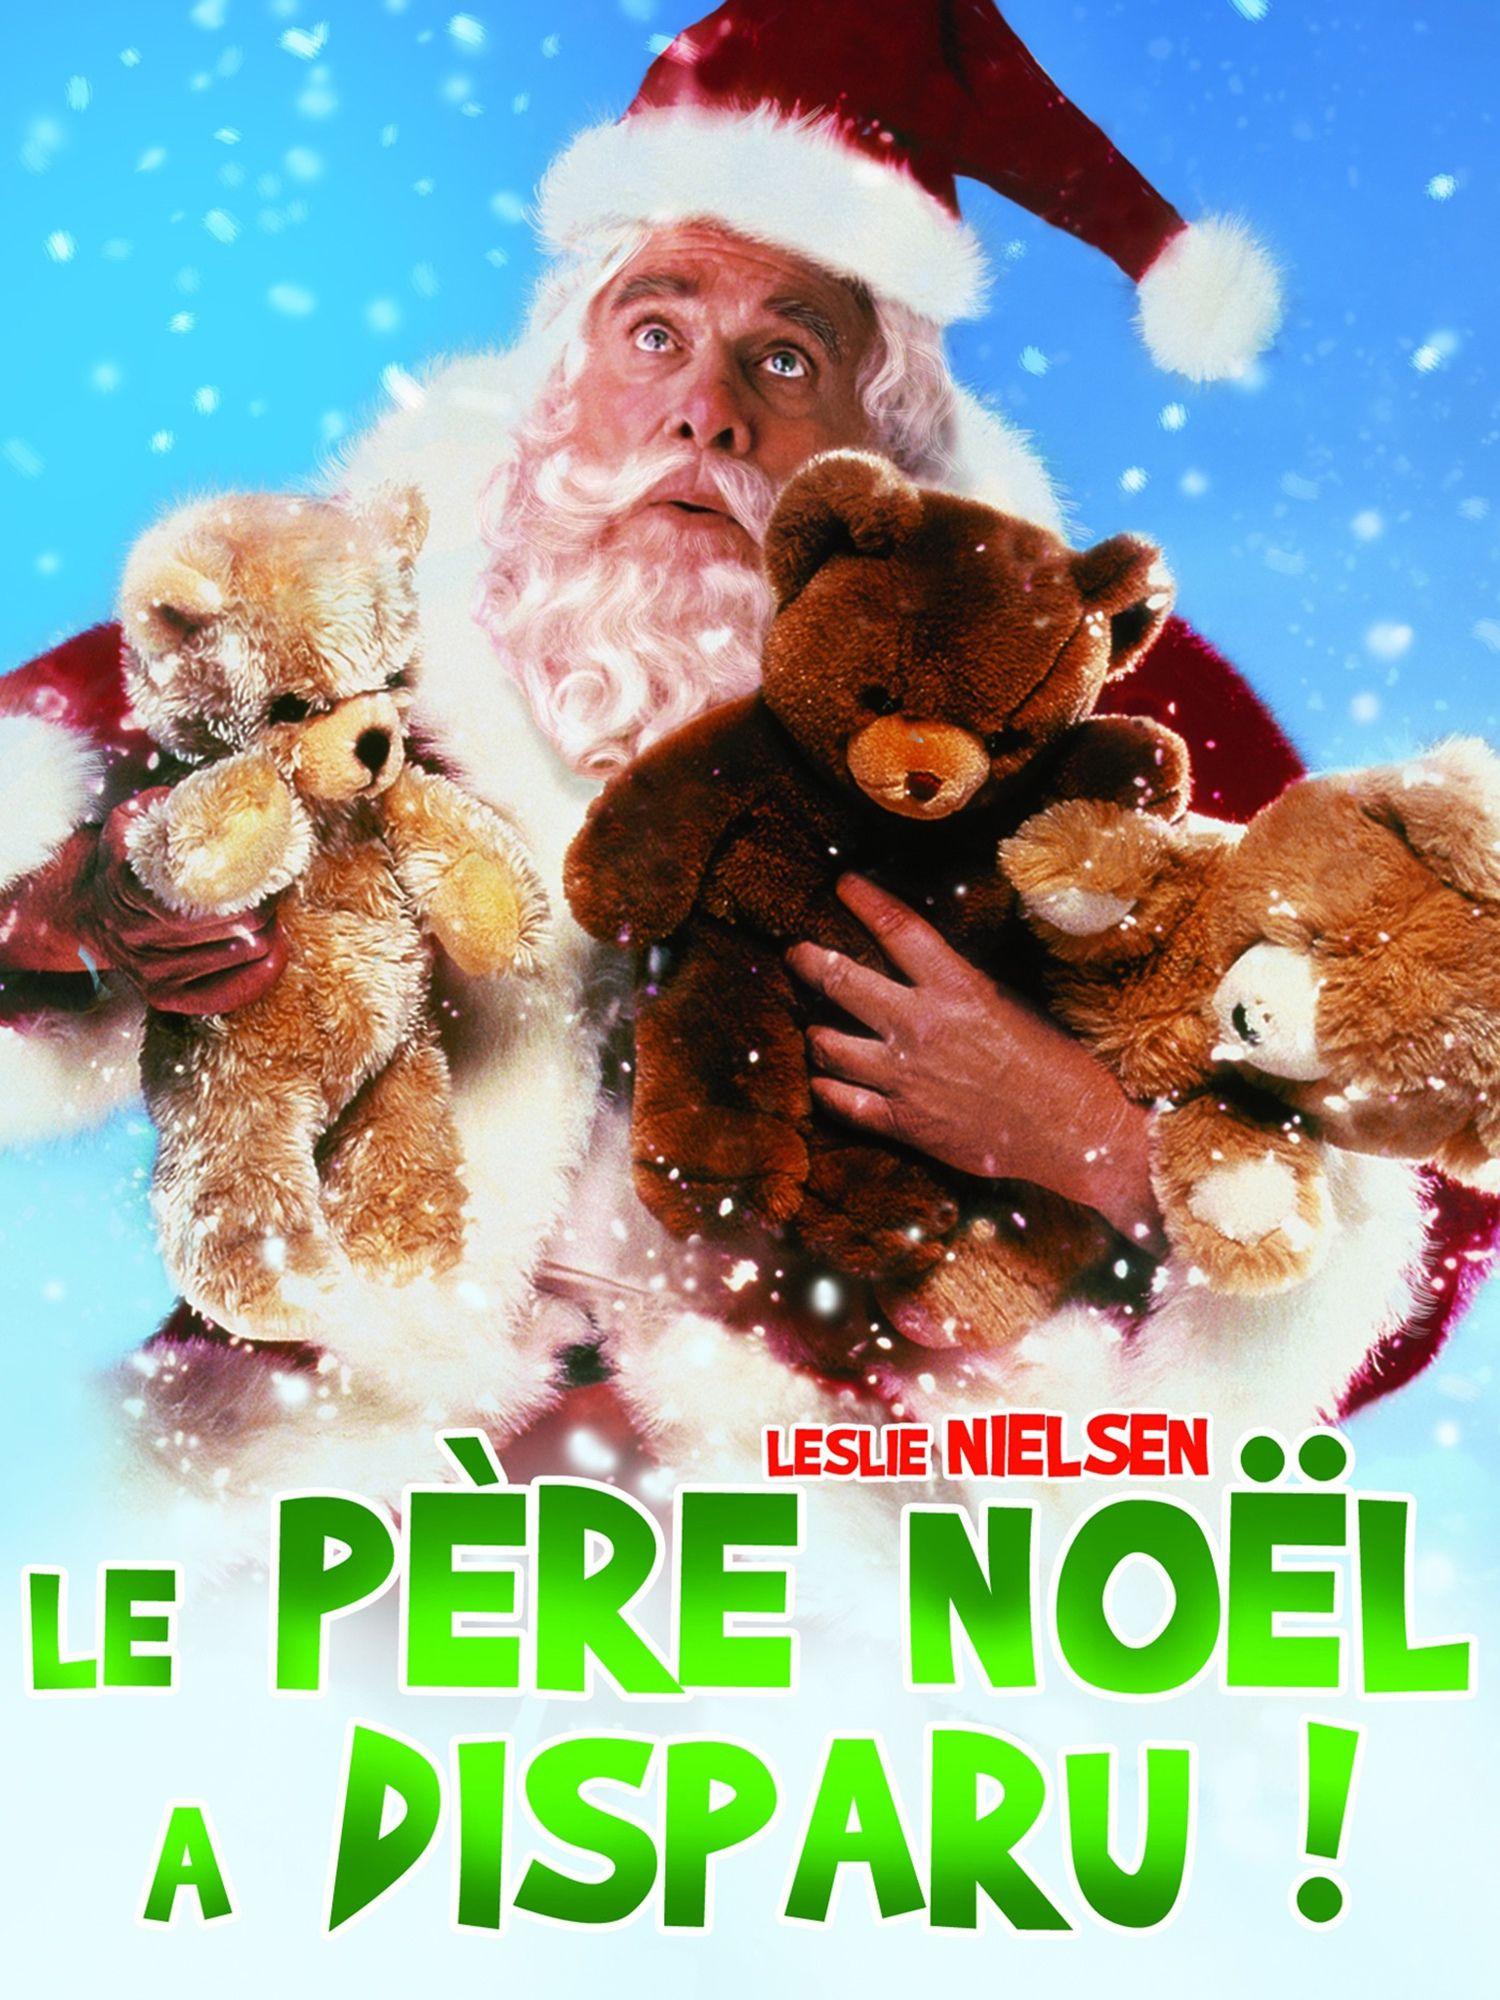 affiche poster pere noel disparu santa who disney